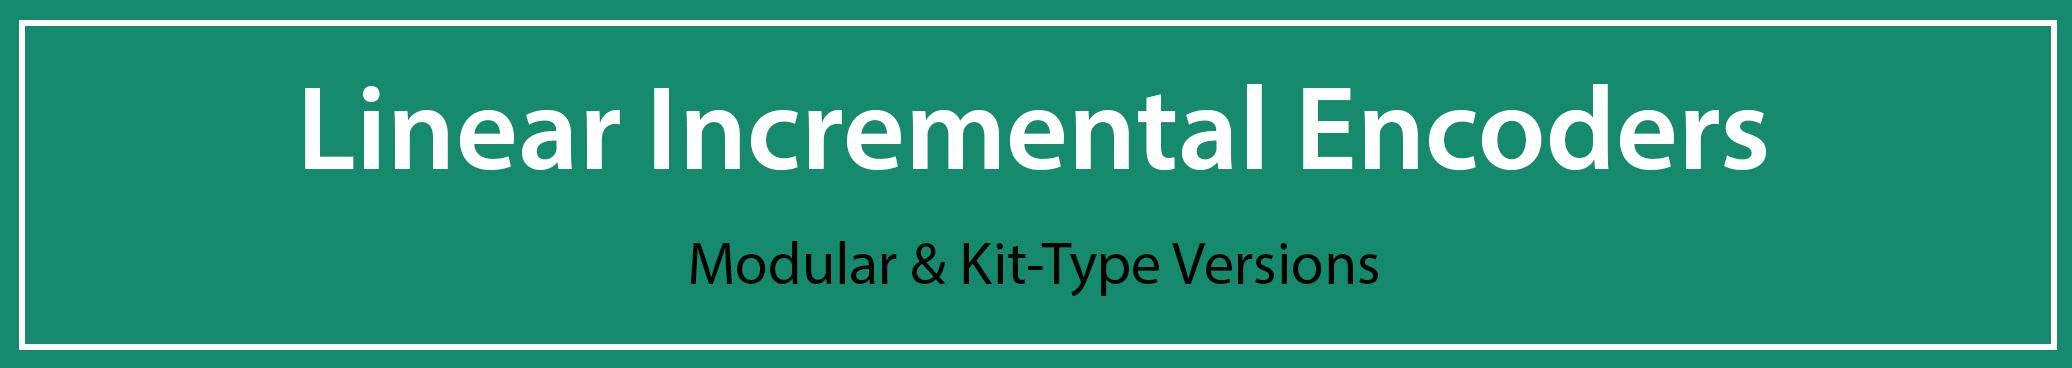 Linear Incremental Encoders- Modular  Kit-Type Versions.jpg